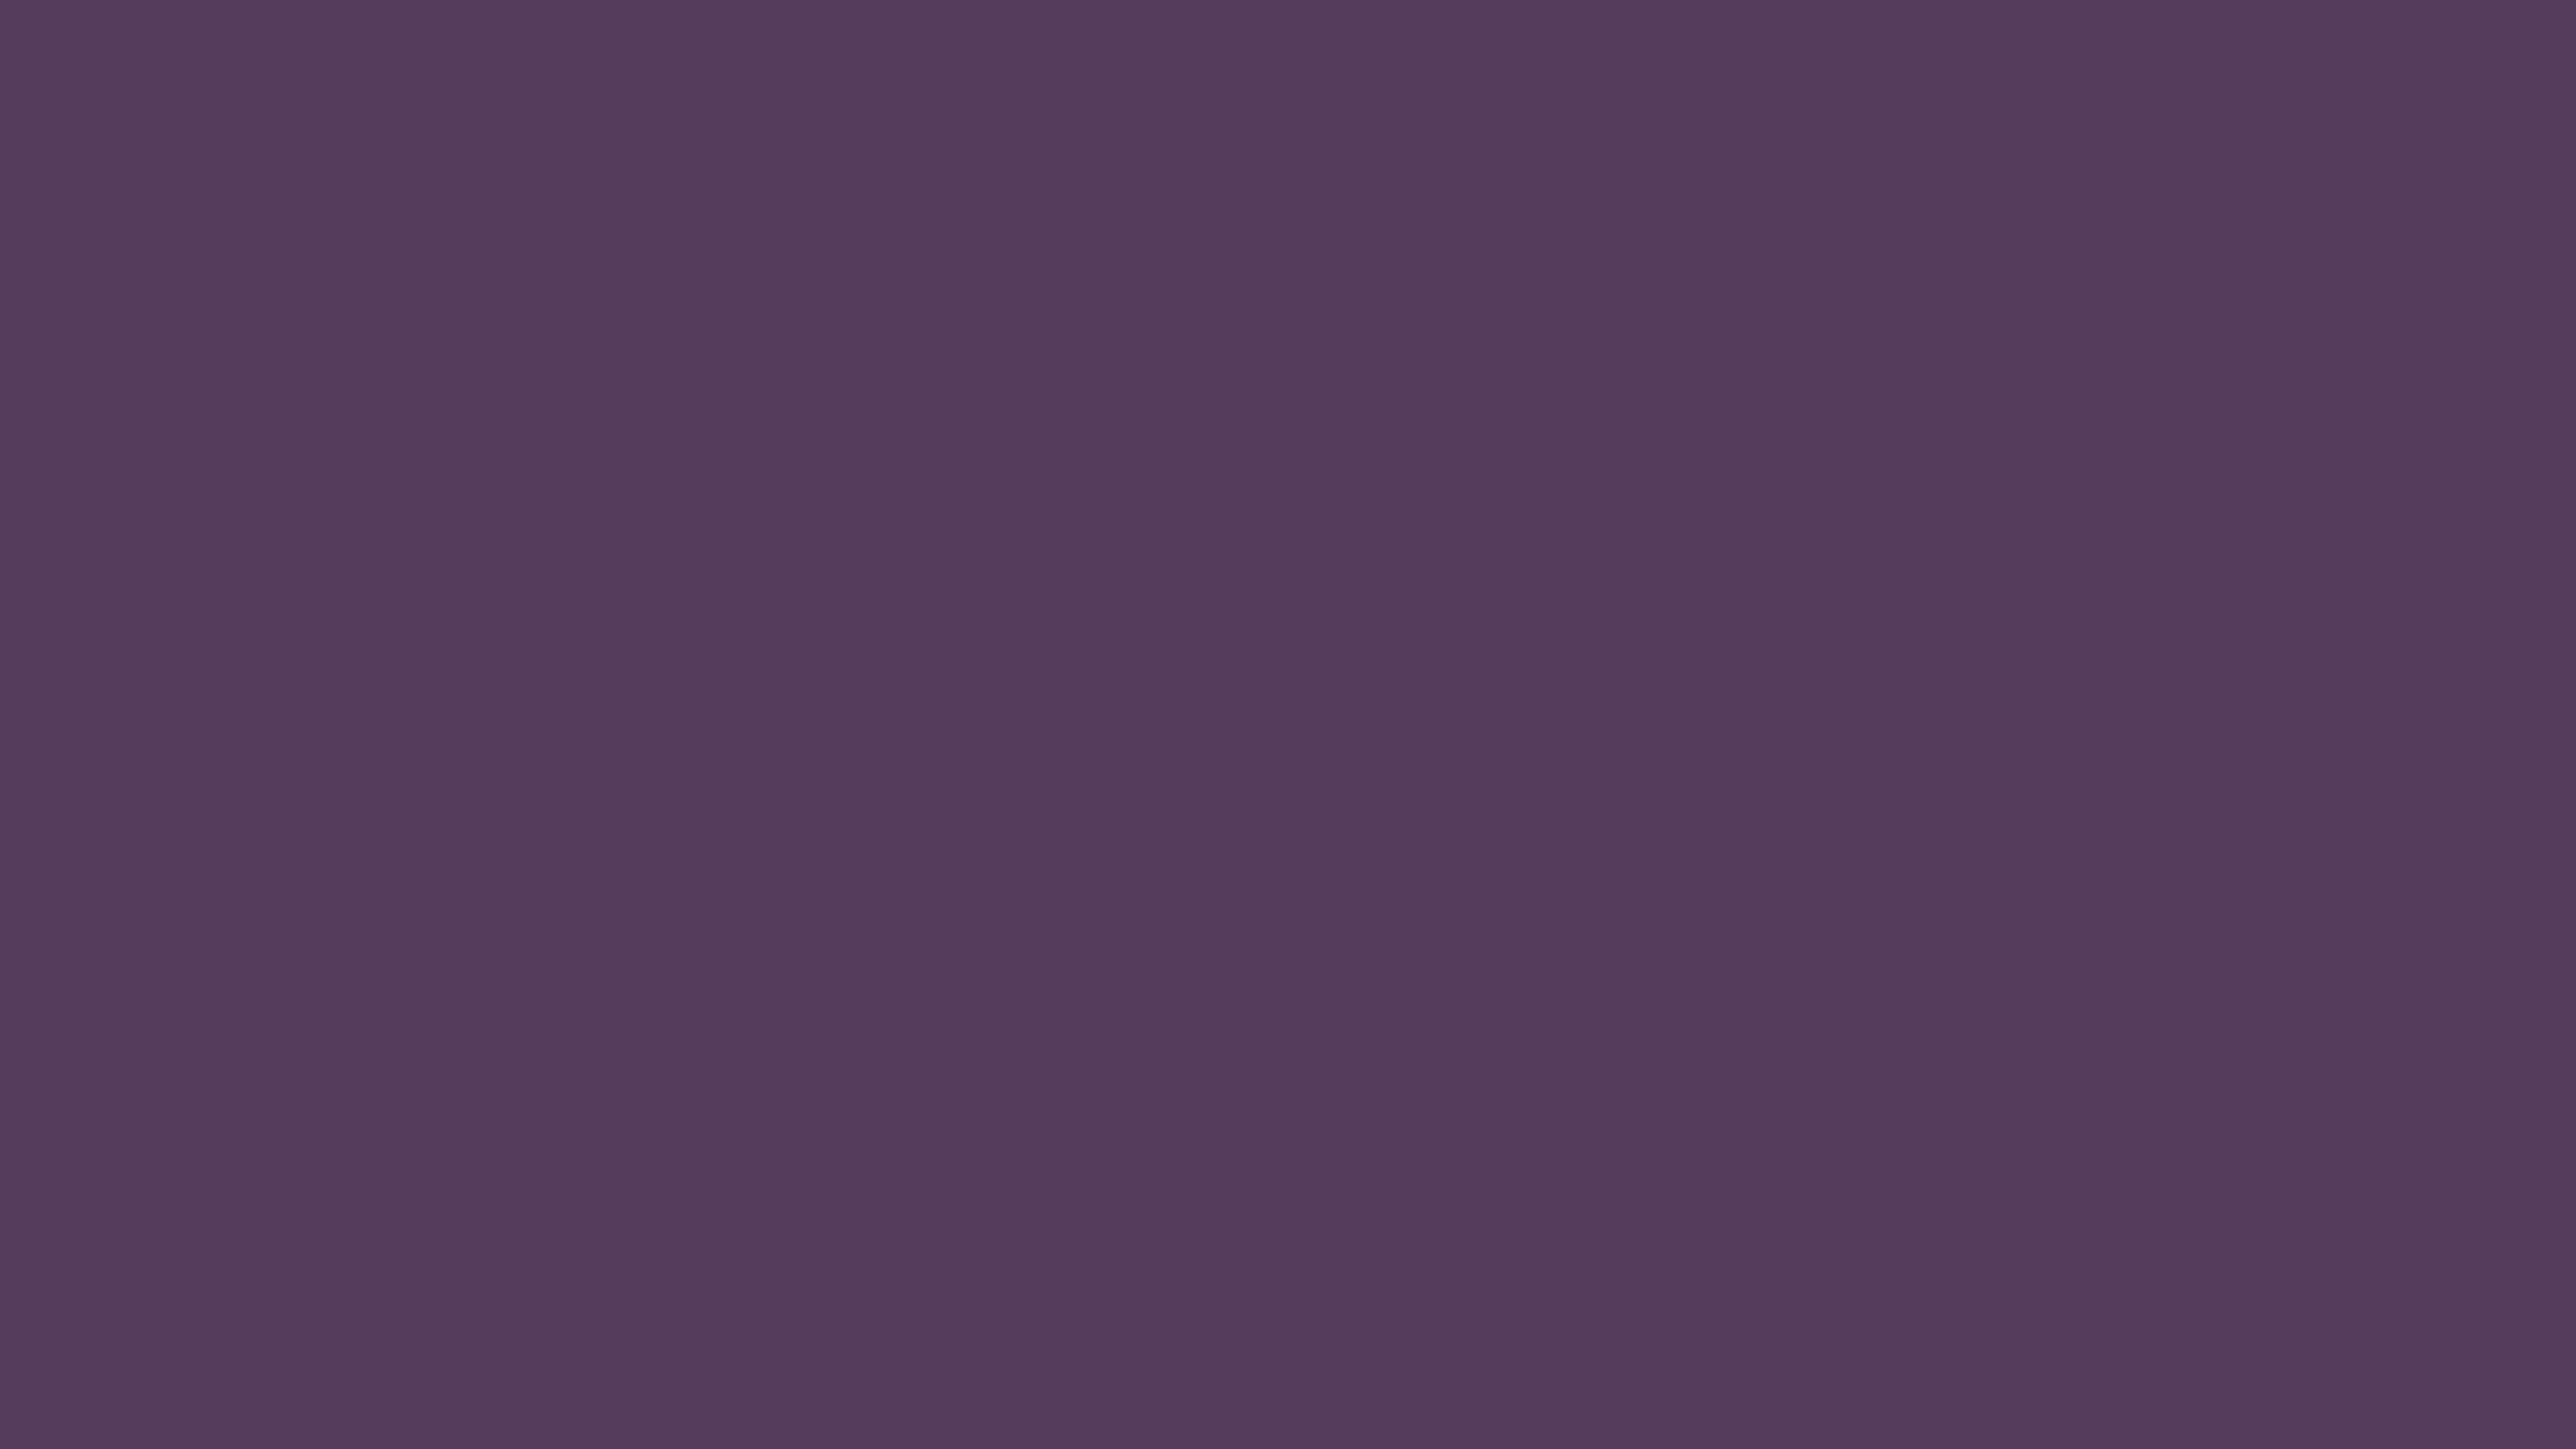 5120x2880 English Violet Solid Color Background